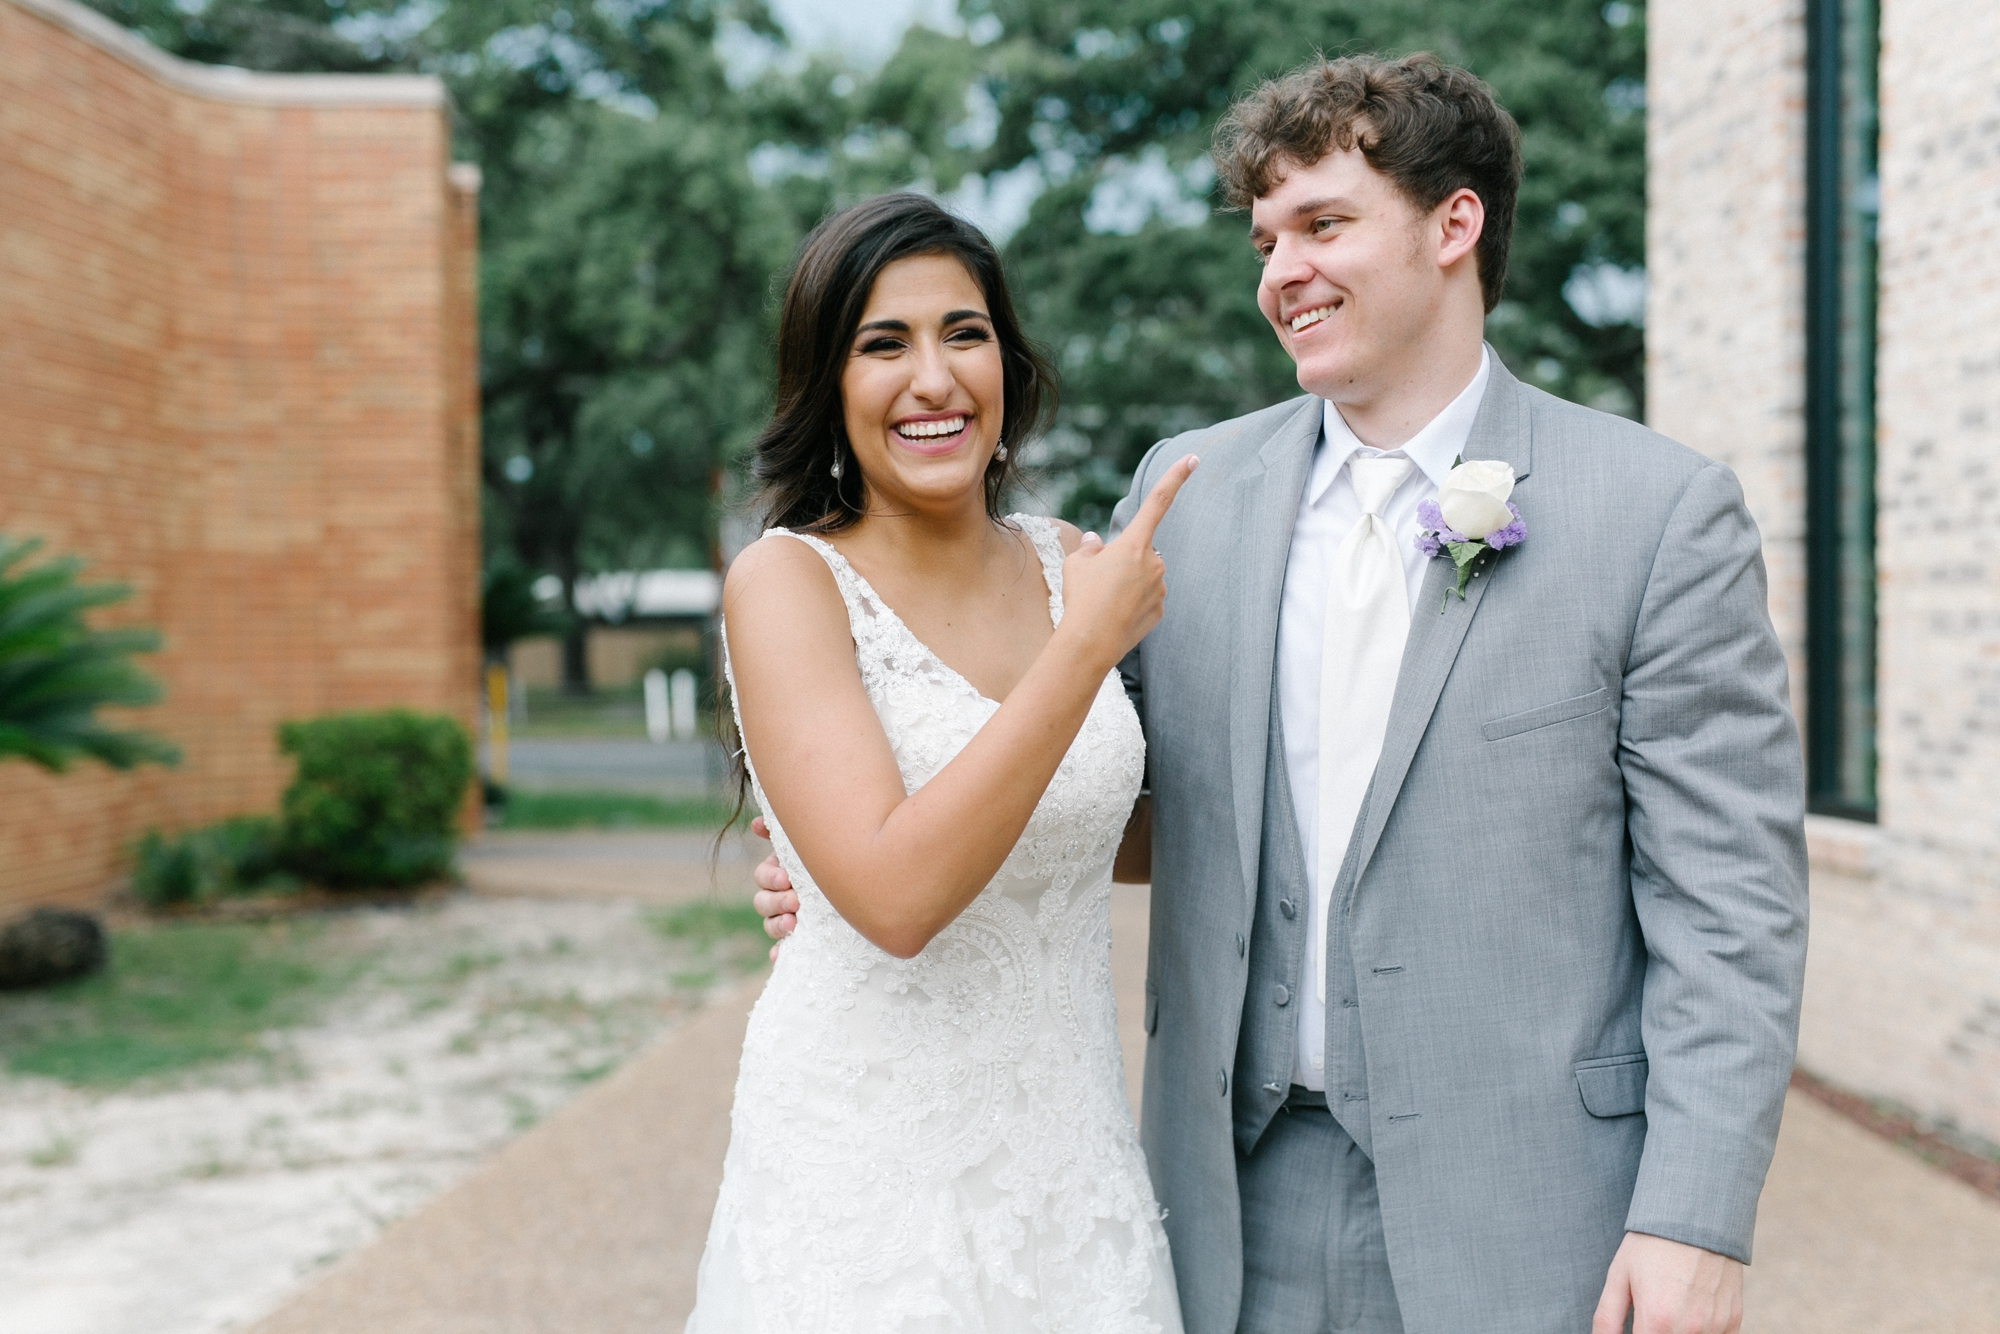 New_Orleans_Wedding_Photographer_1397.jpg